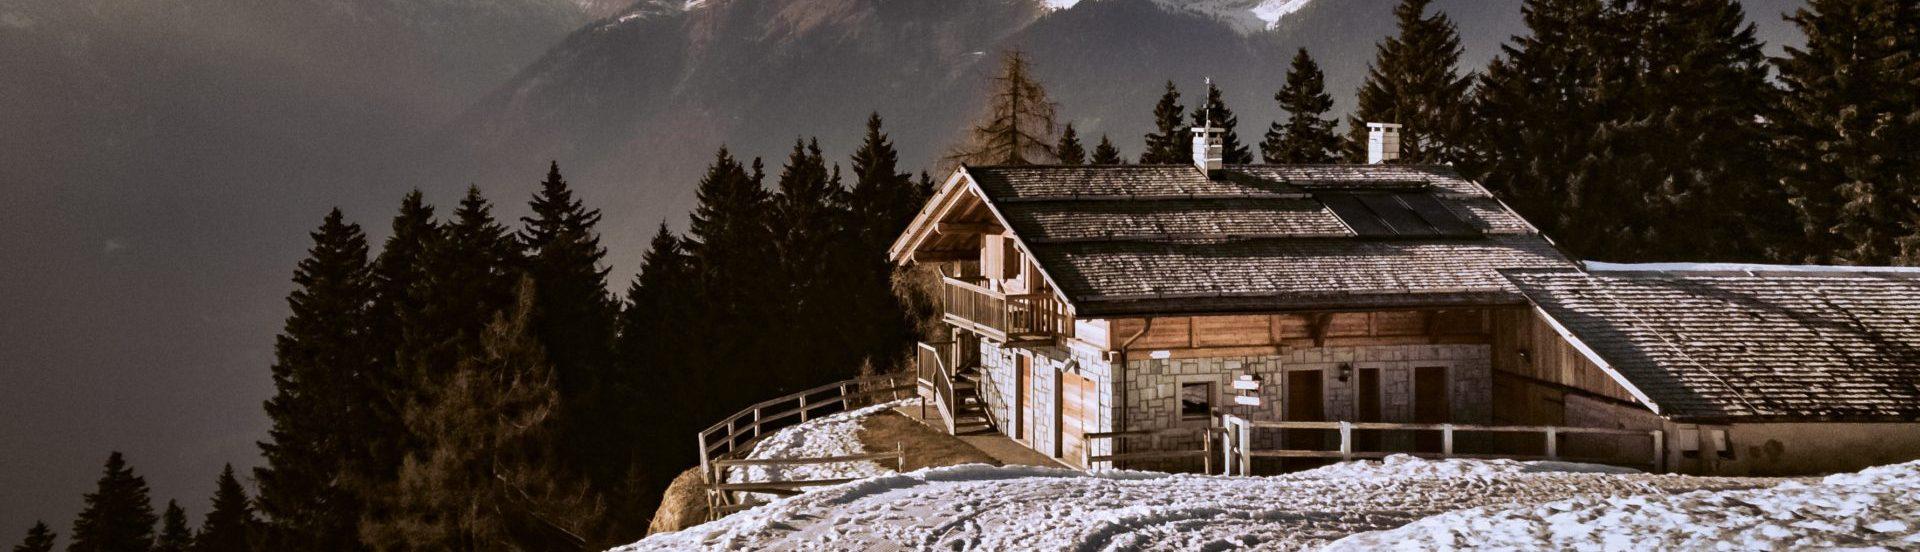 Best Ski Chalets